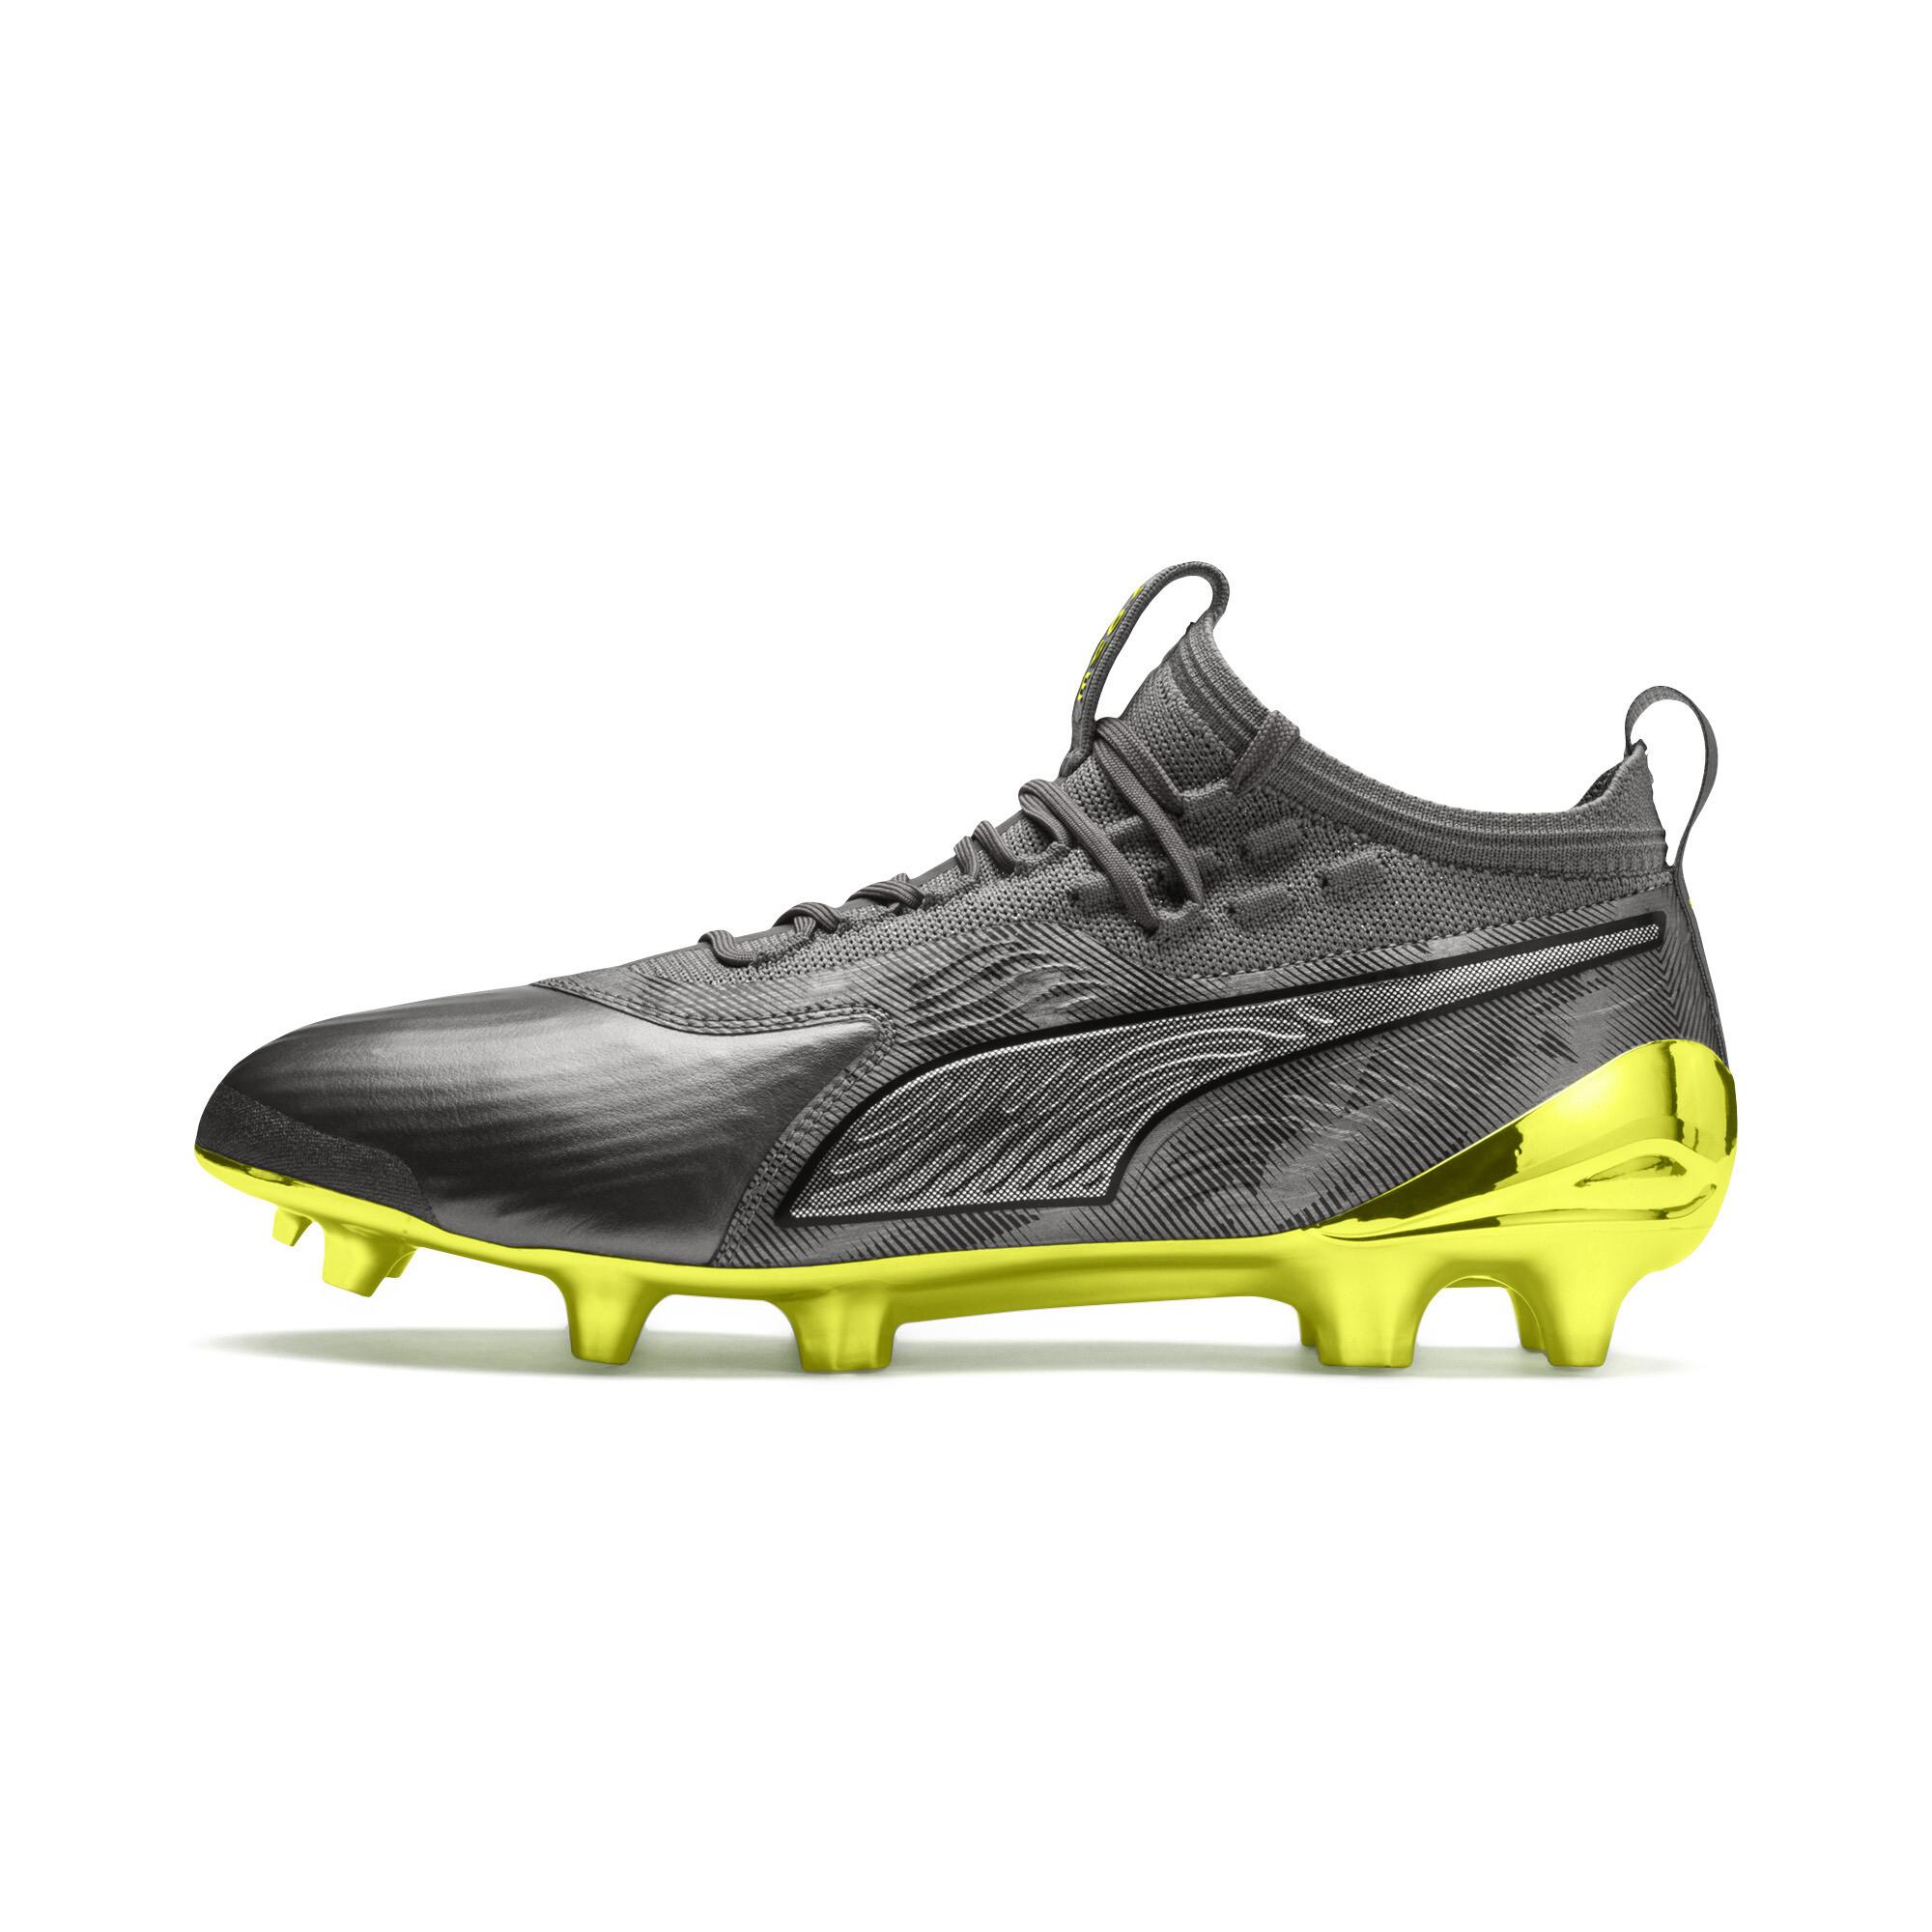 Image Puma PUMA ONE 19.1 Limited Edition FG/AG Men's Football Boots #1